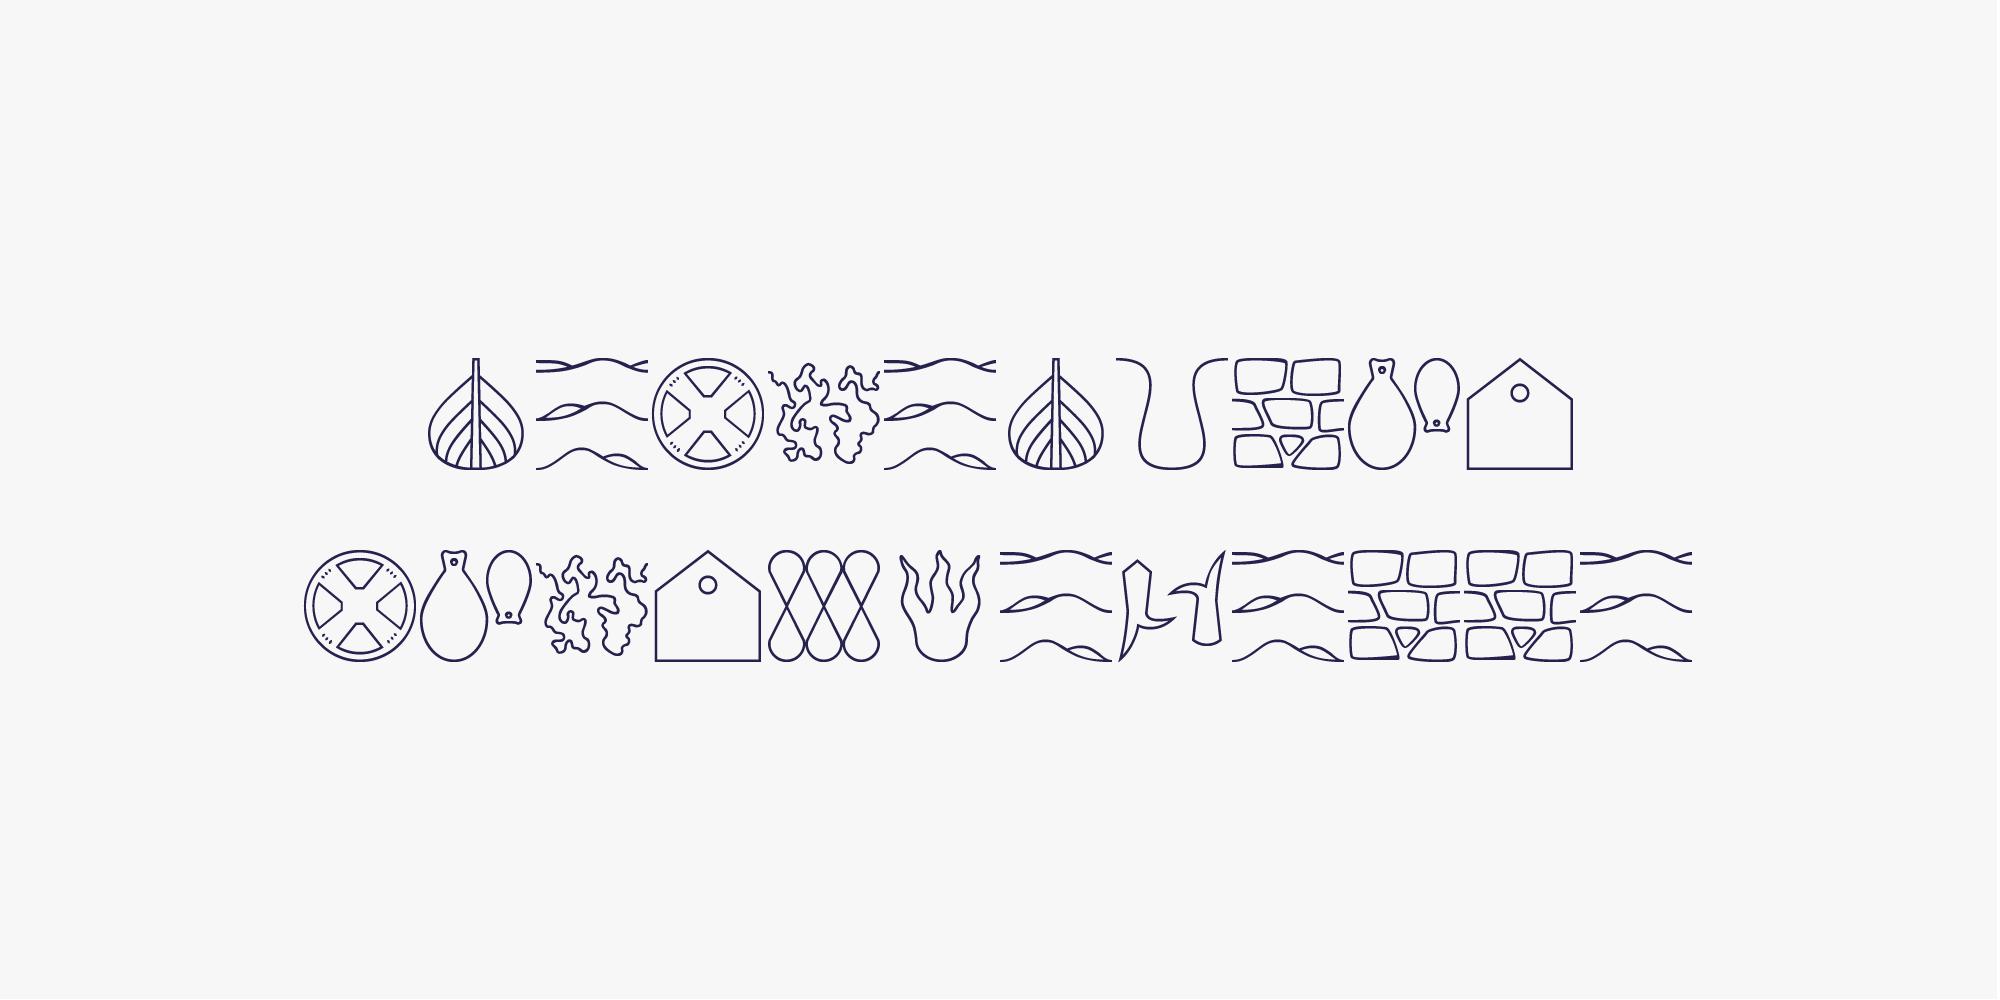 Rovaniemi-symboli-kirjasin